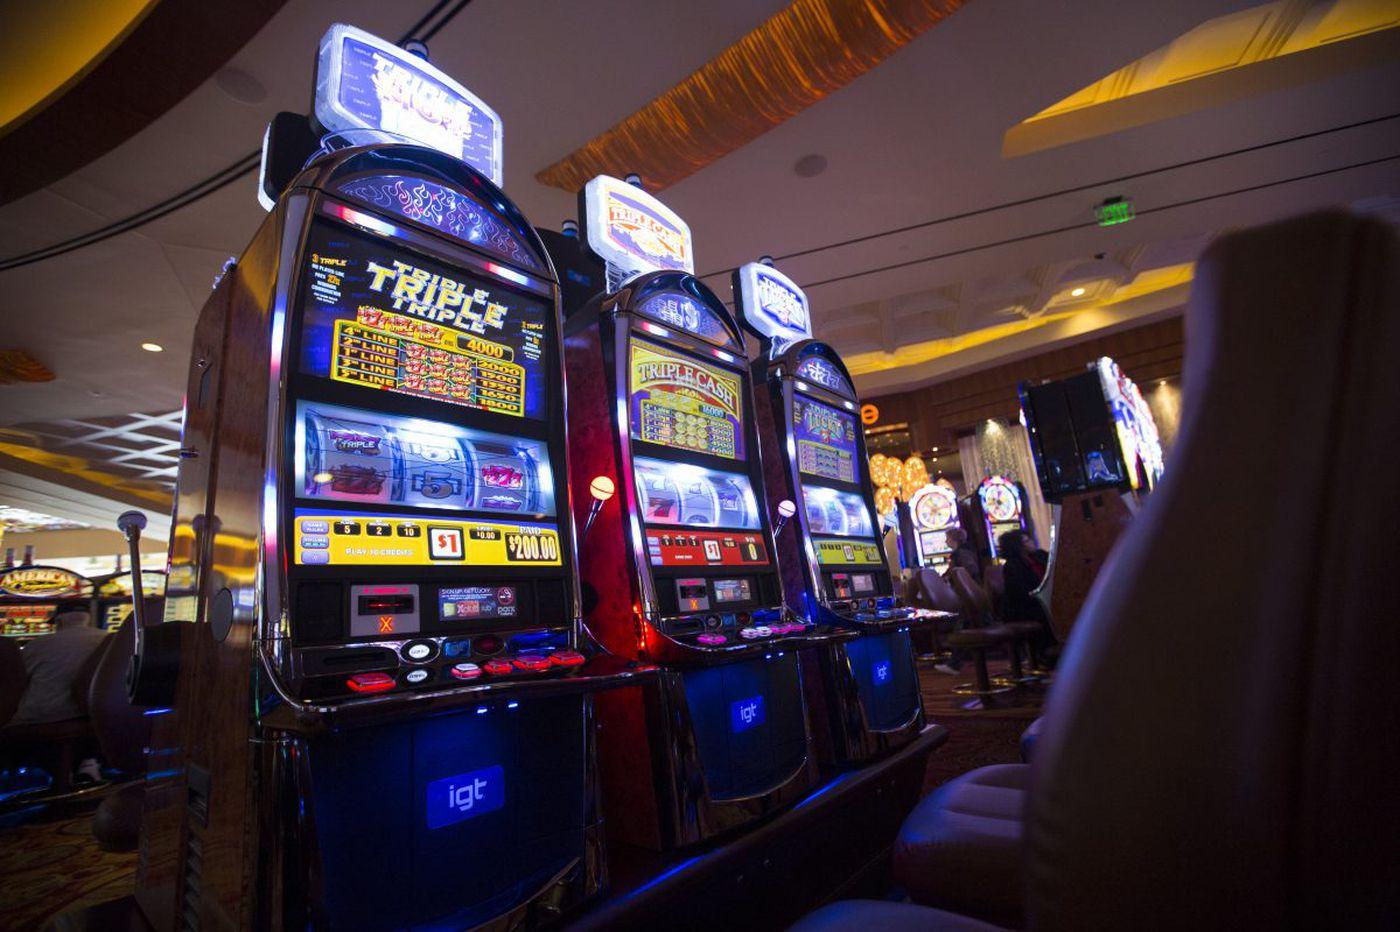 Pa. towns gamble on gambling, Villanova heads to championship, Cosby retrial set to begin   Morning Newsletter